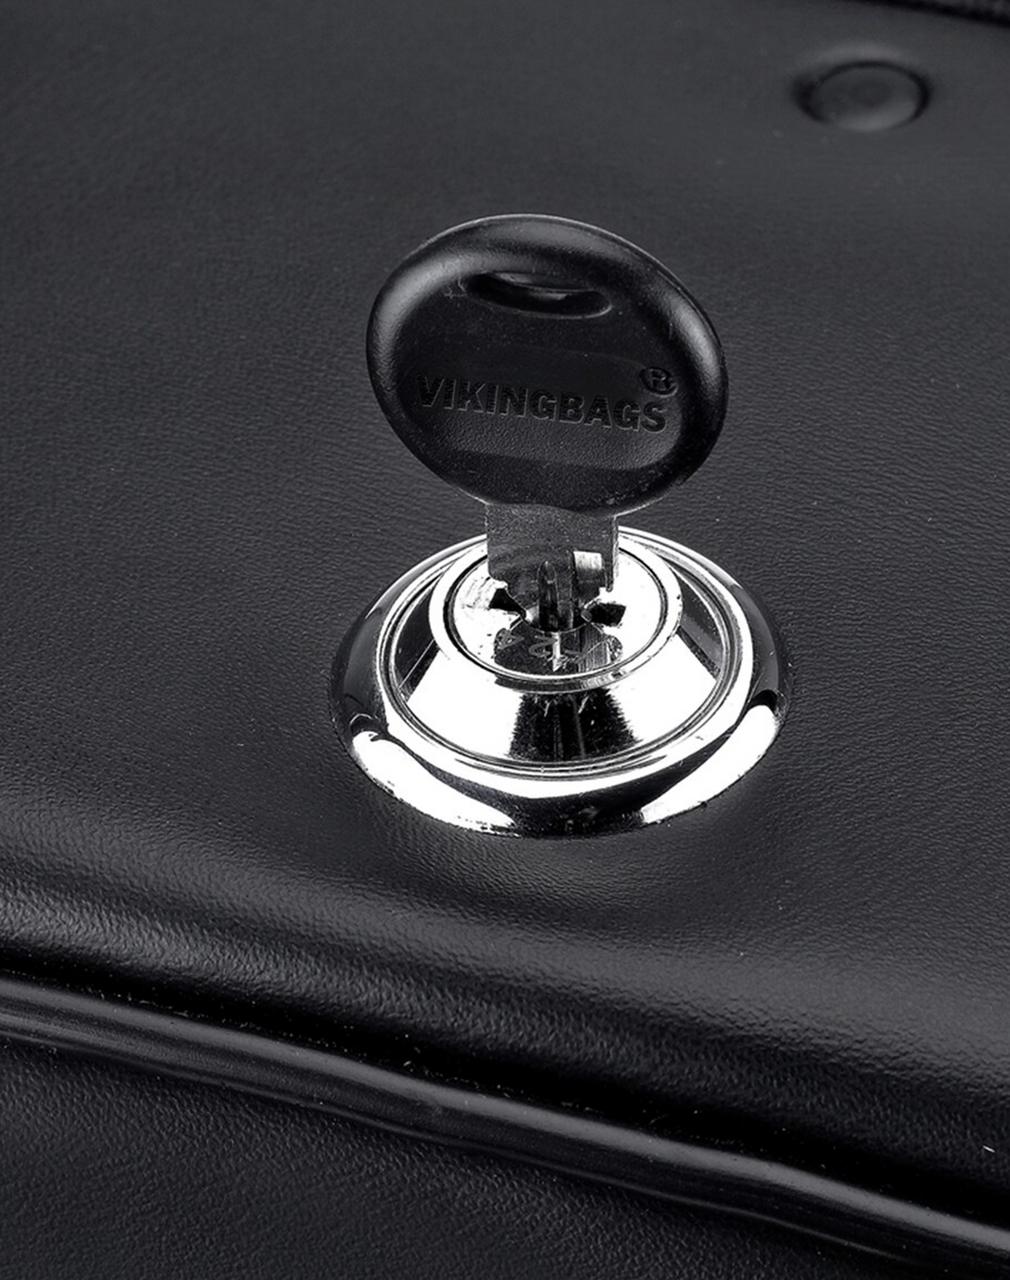 Honda 750 Shadow Phantom Large SS Shock Cutout Slanted Studded Motorcycle Saddlebags lock key view